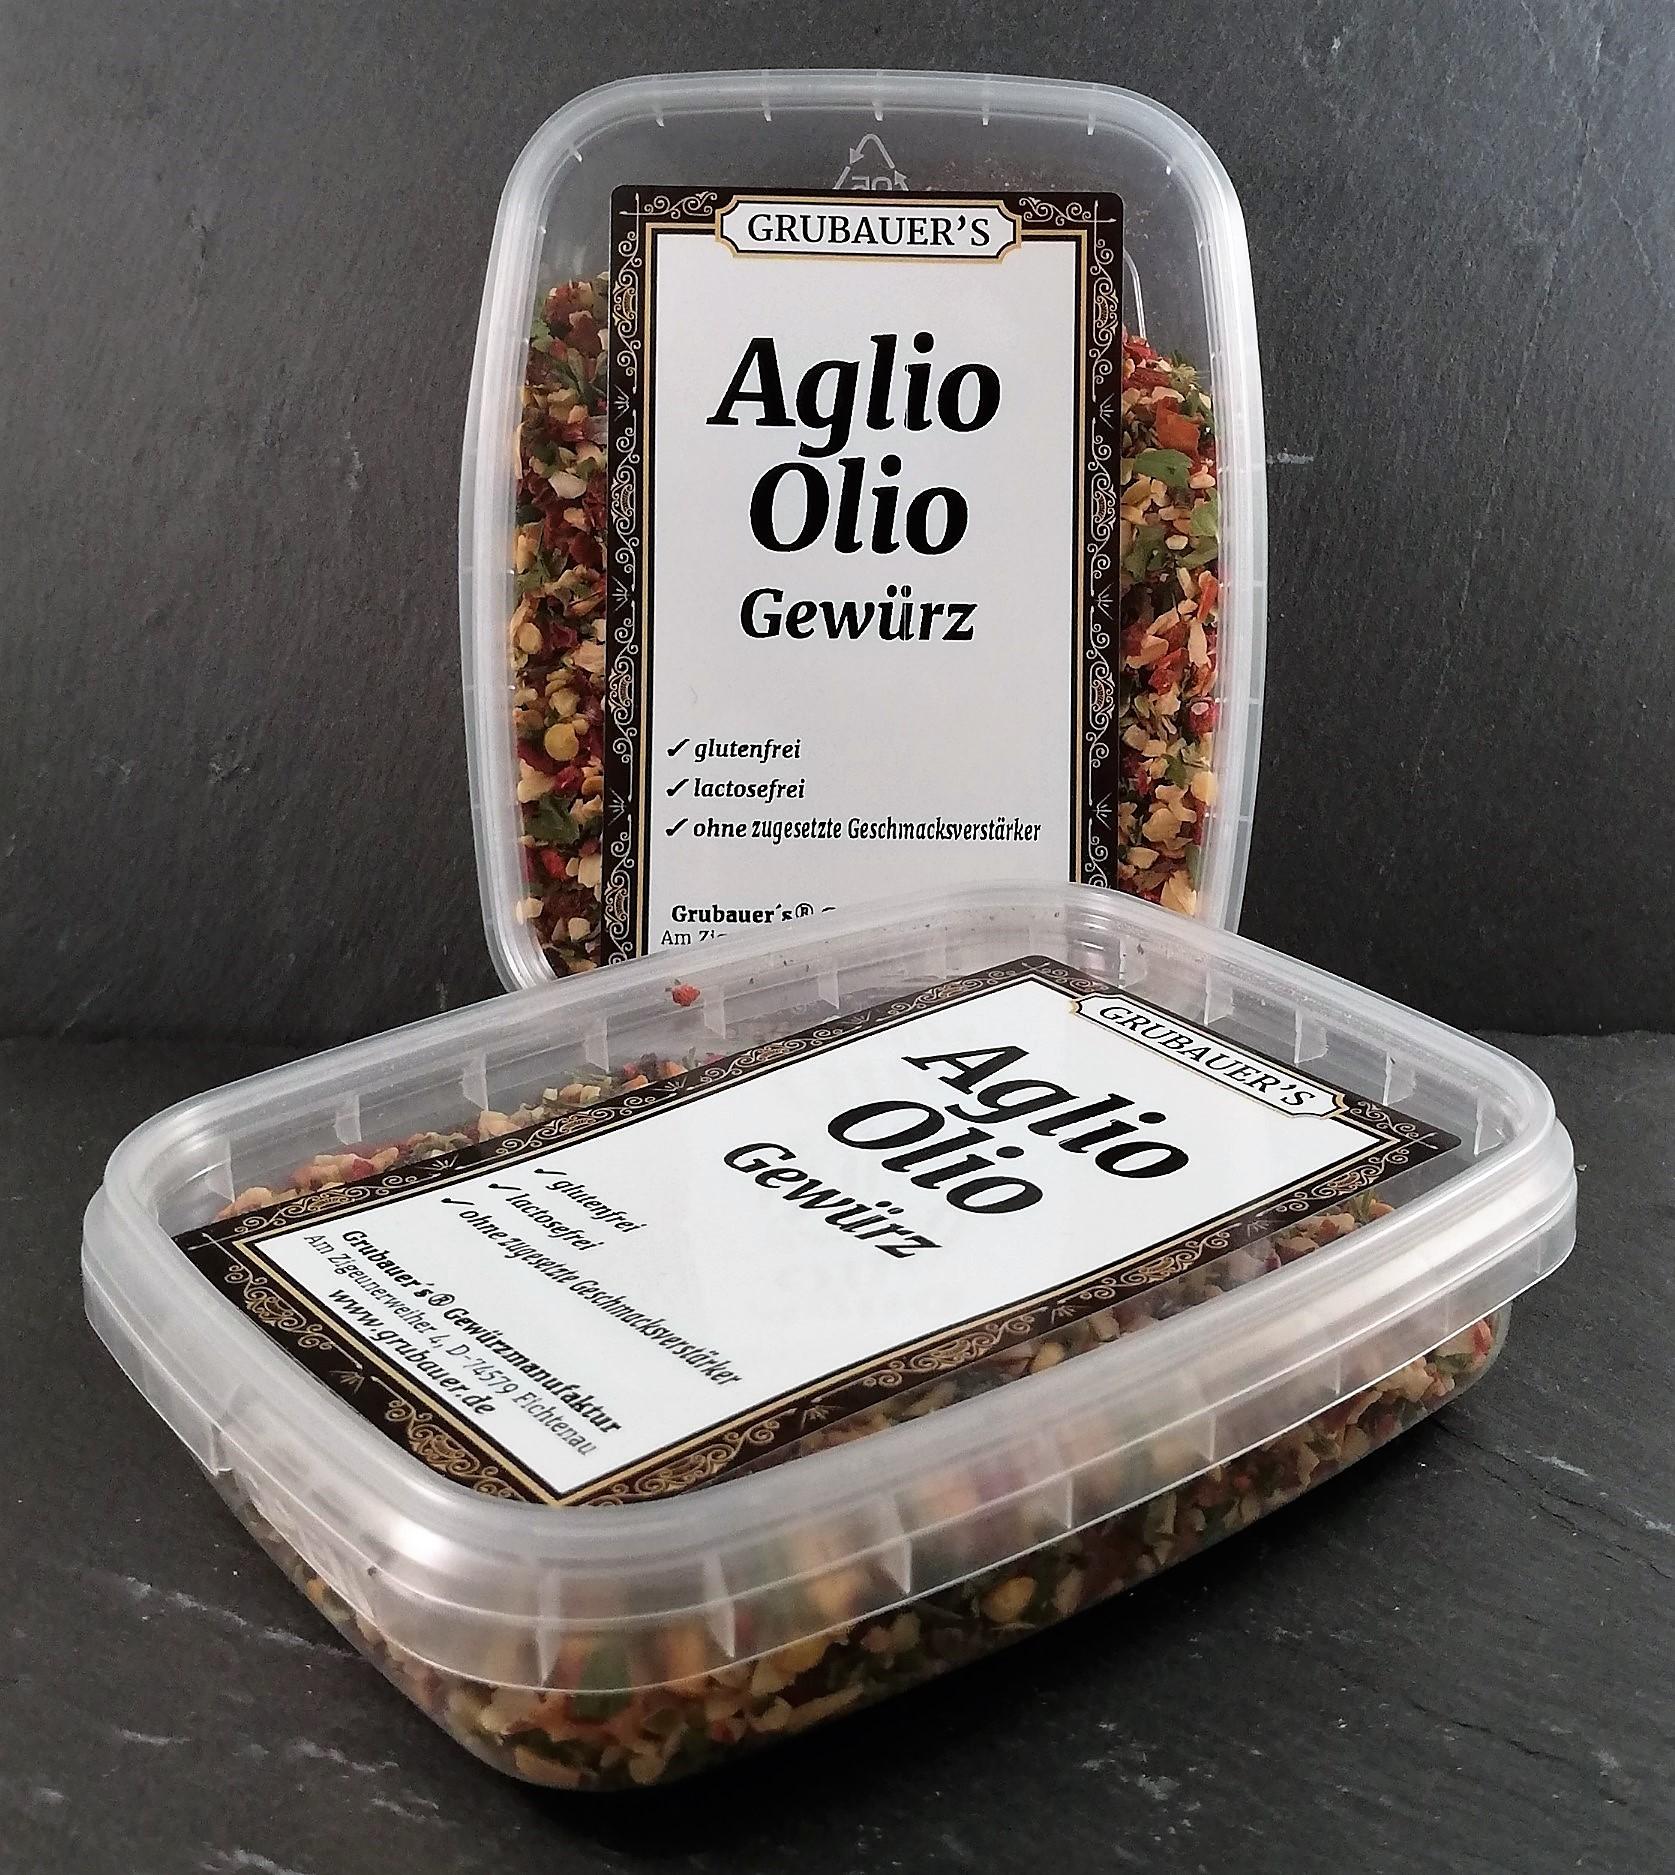 Aglio-Olio-Gewürz (Peperoncino)